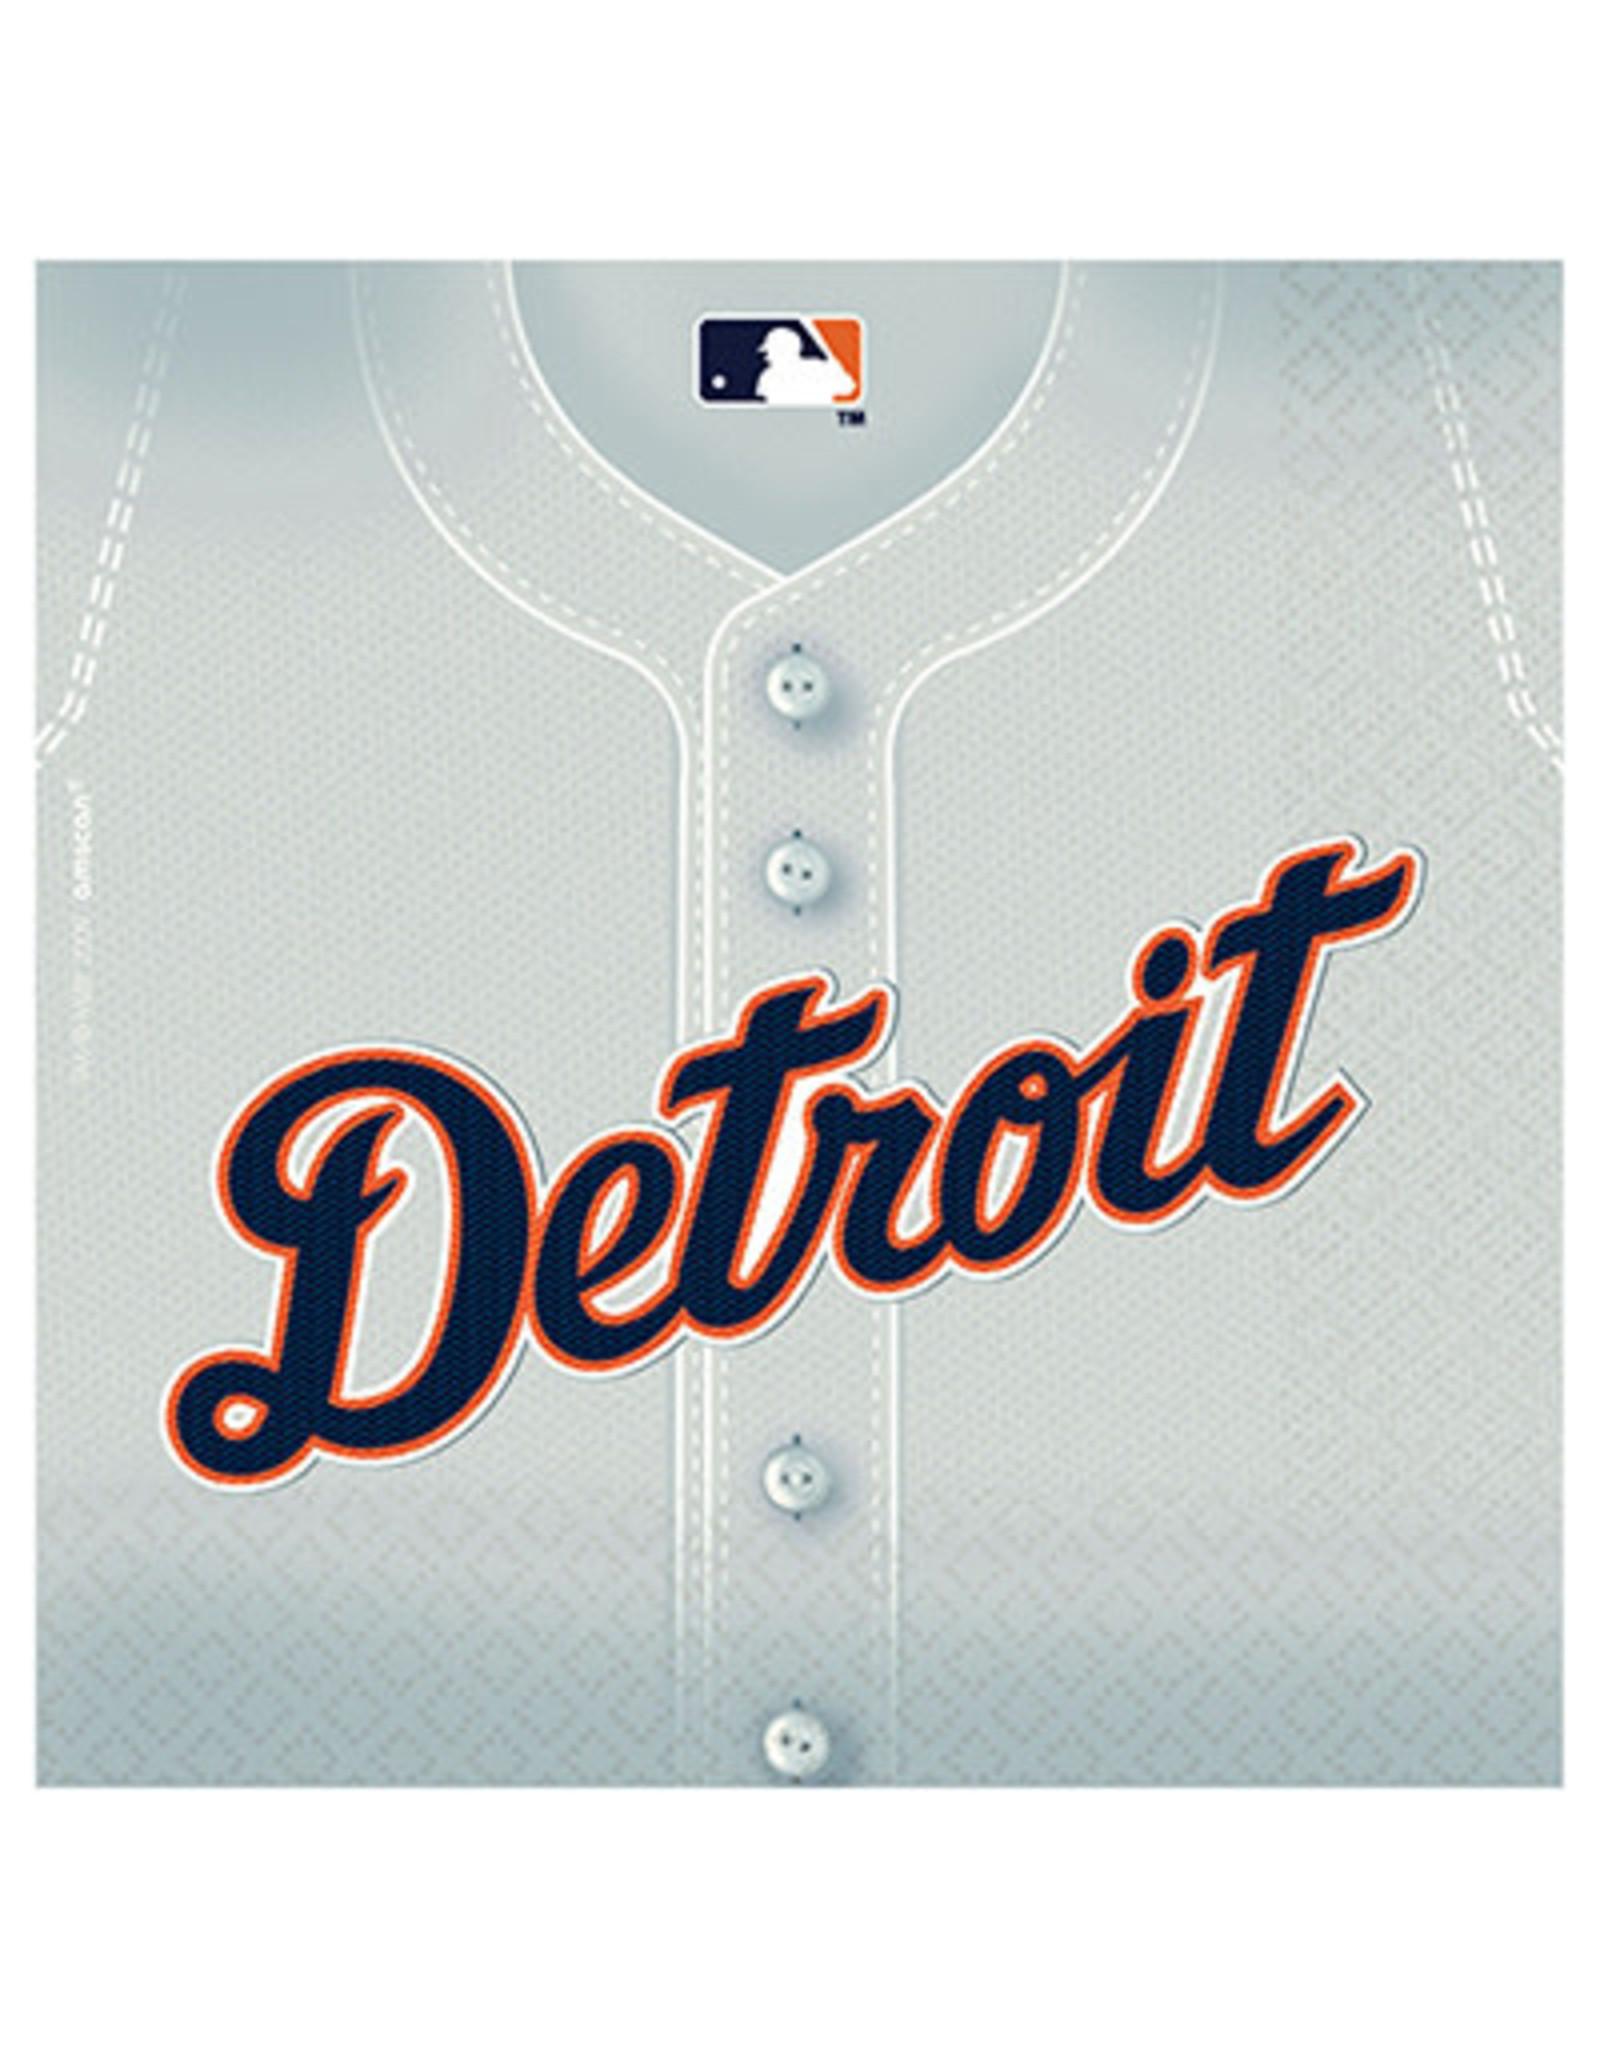 Amscan Detroit Tigers Lun. Napkins - 36ct.